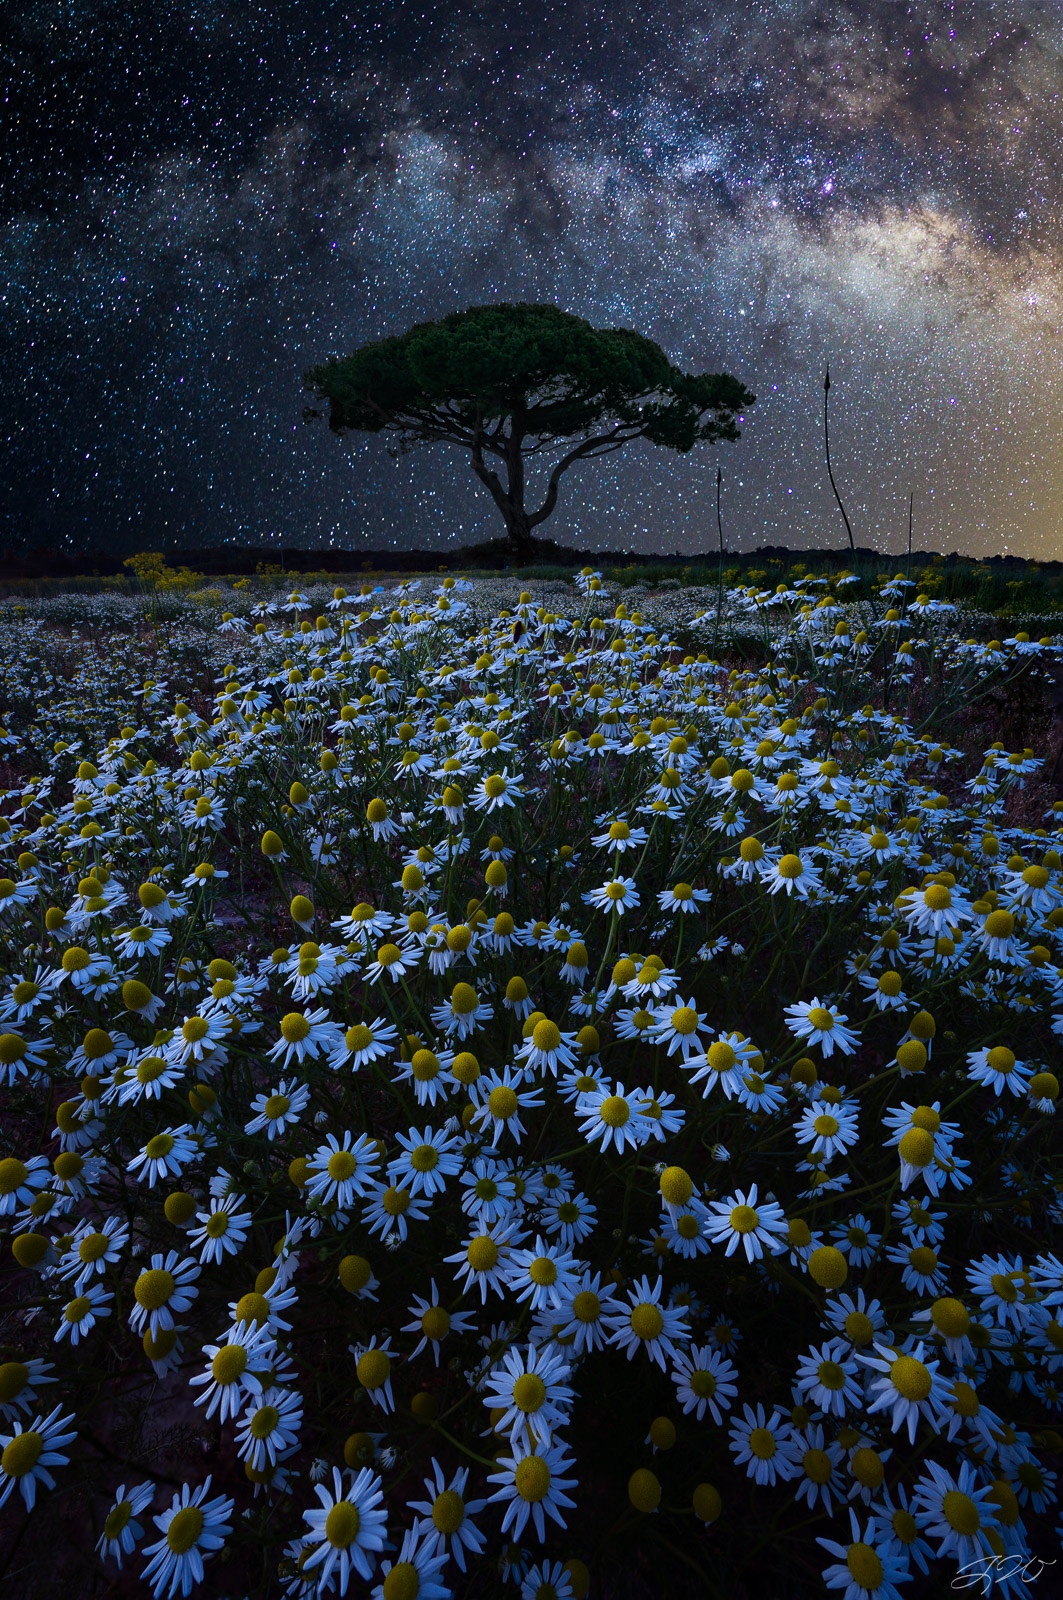 lone tree, daisies, milky way, night sky, wildflowers, astrophotography, sacred, sony alpha, photo